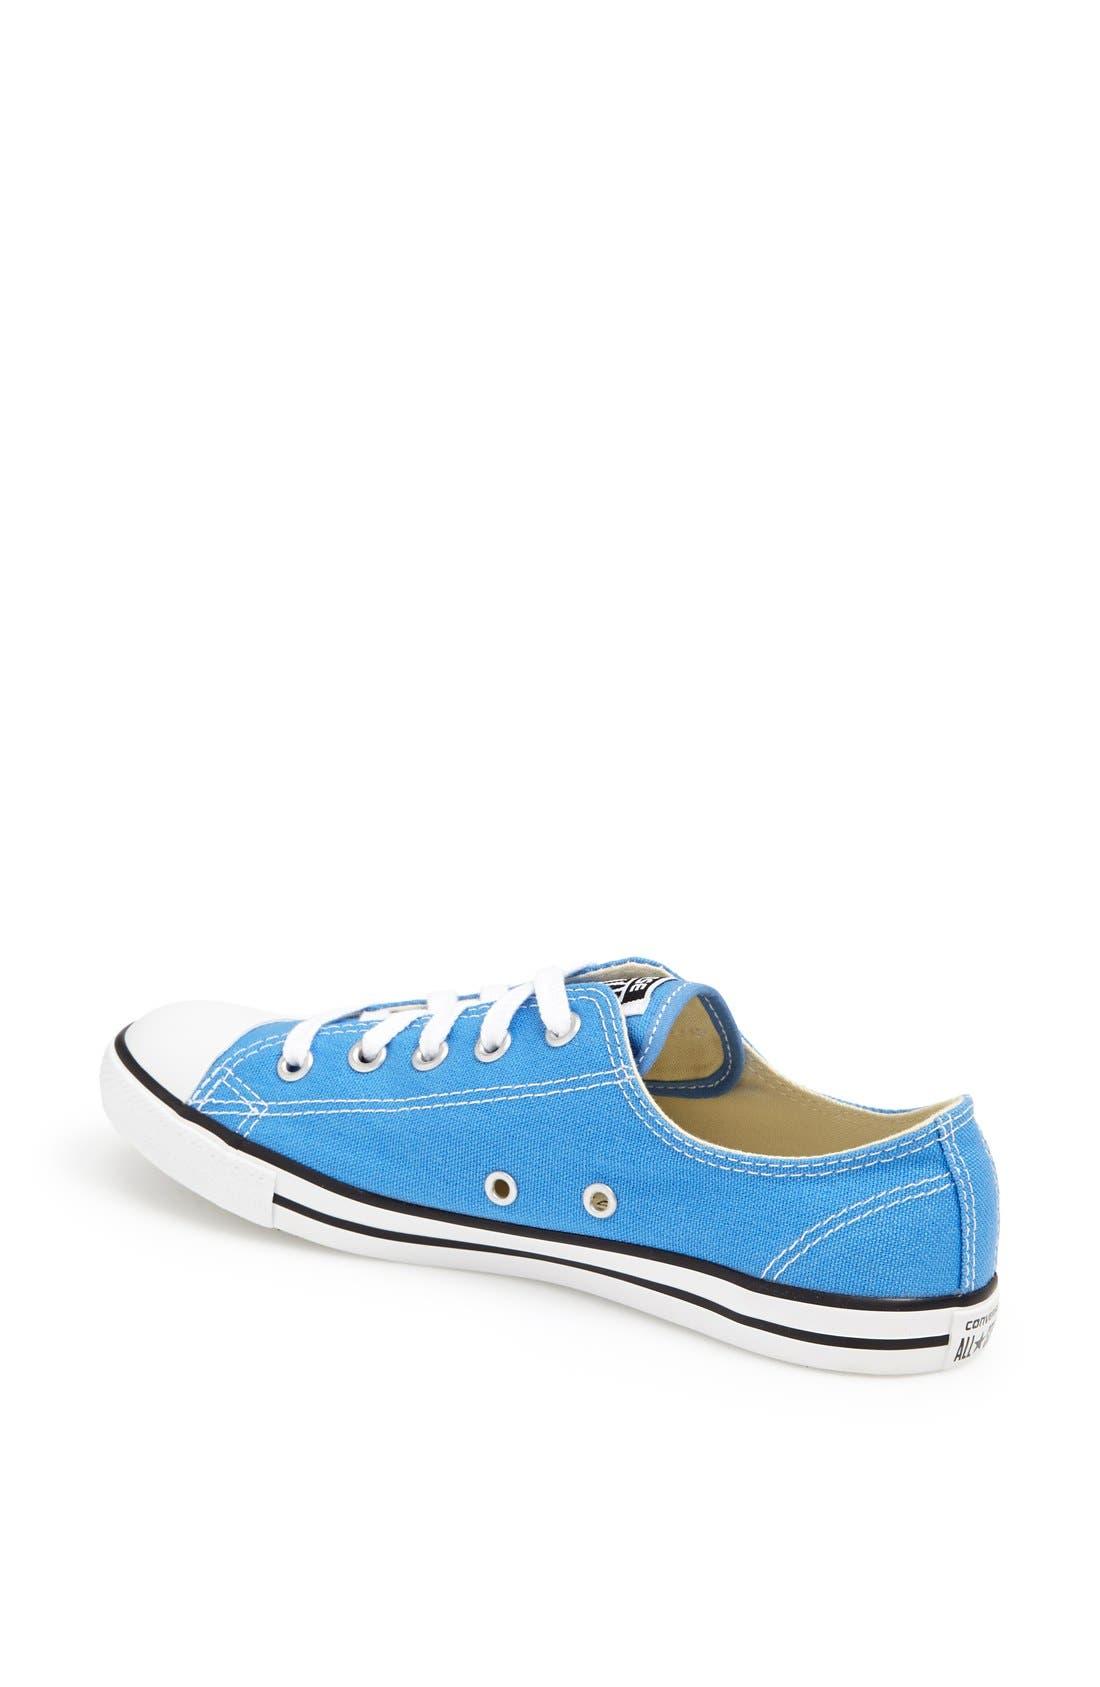 Alternate Image 2  - Converse Chuck Taylor® All Star® 'Dainty' Sneaker (Women)